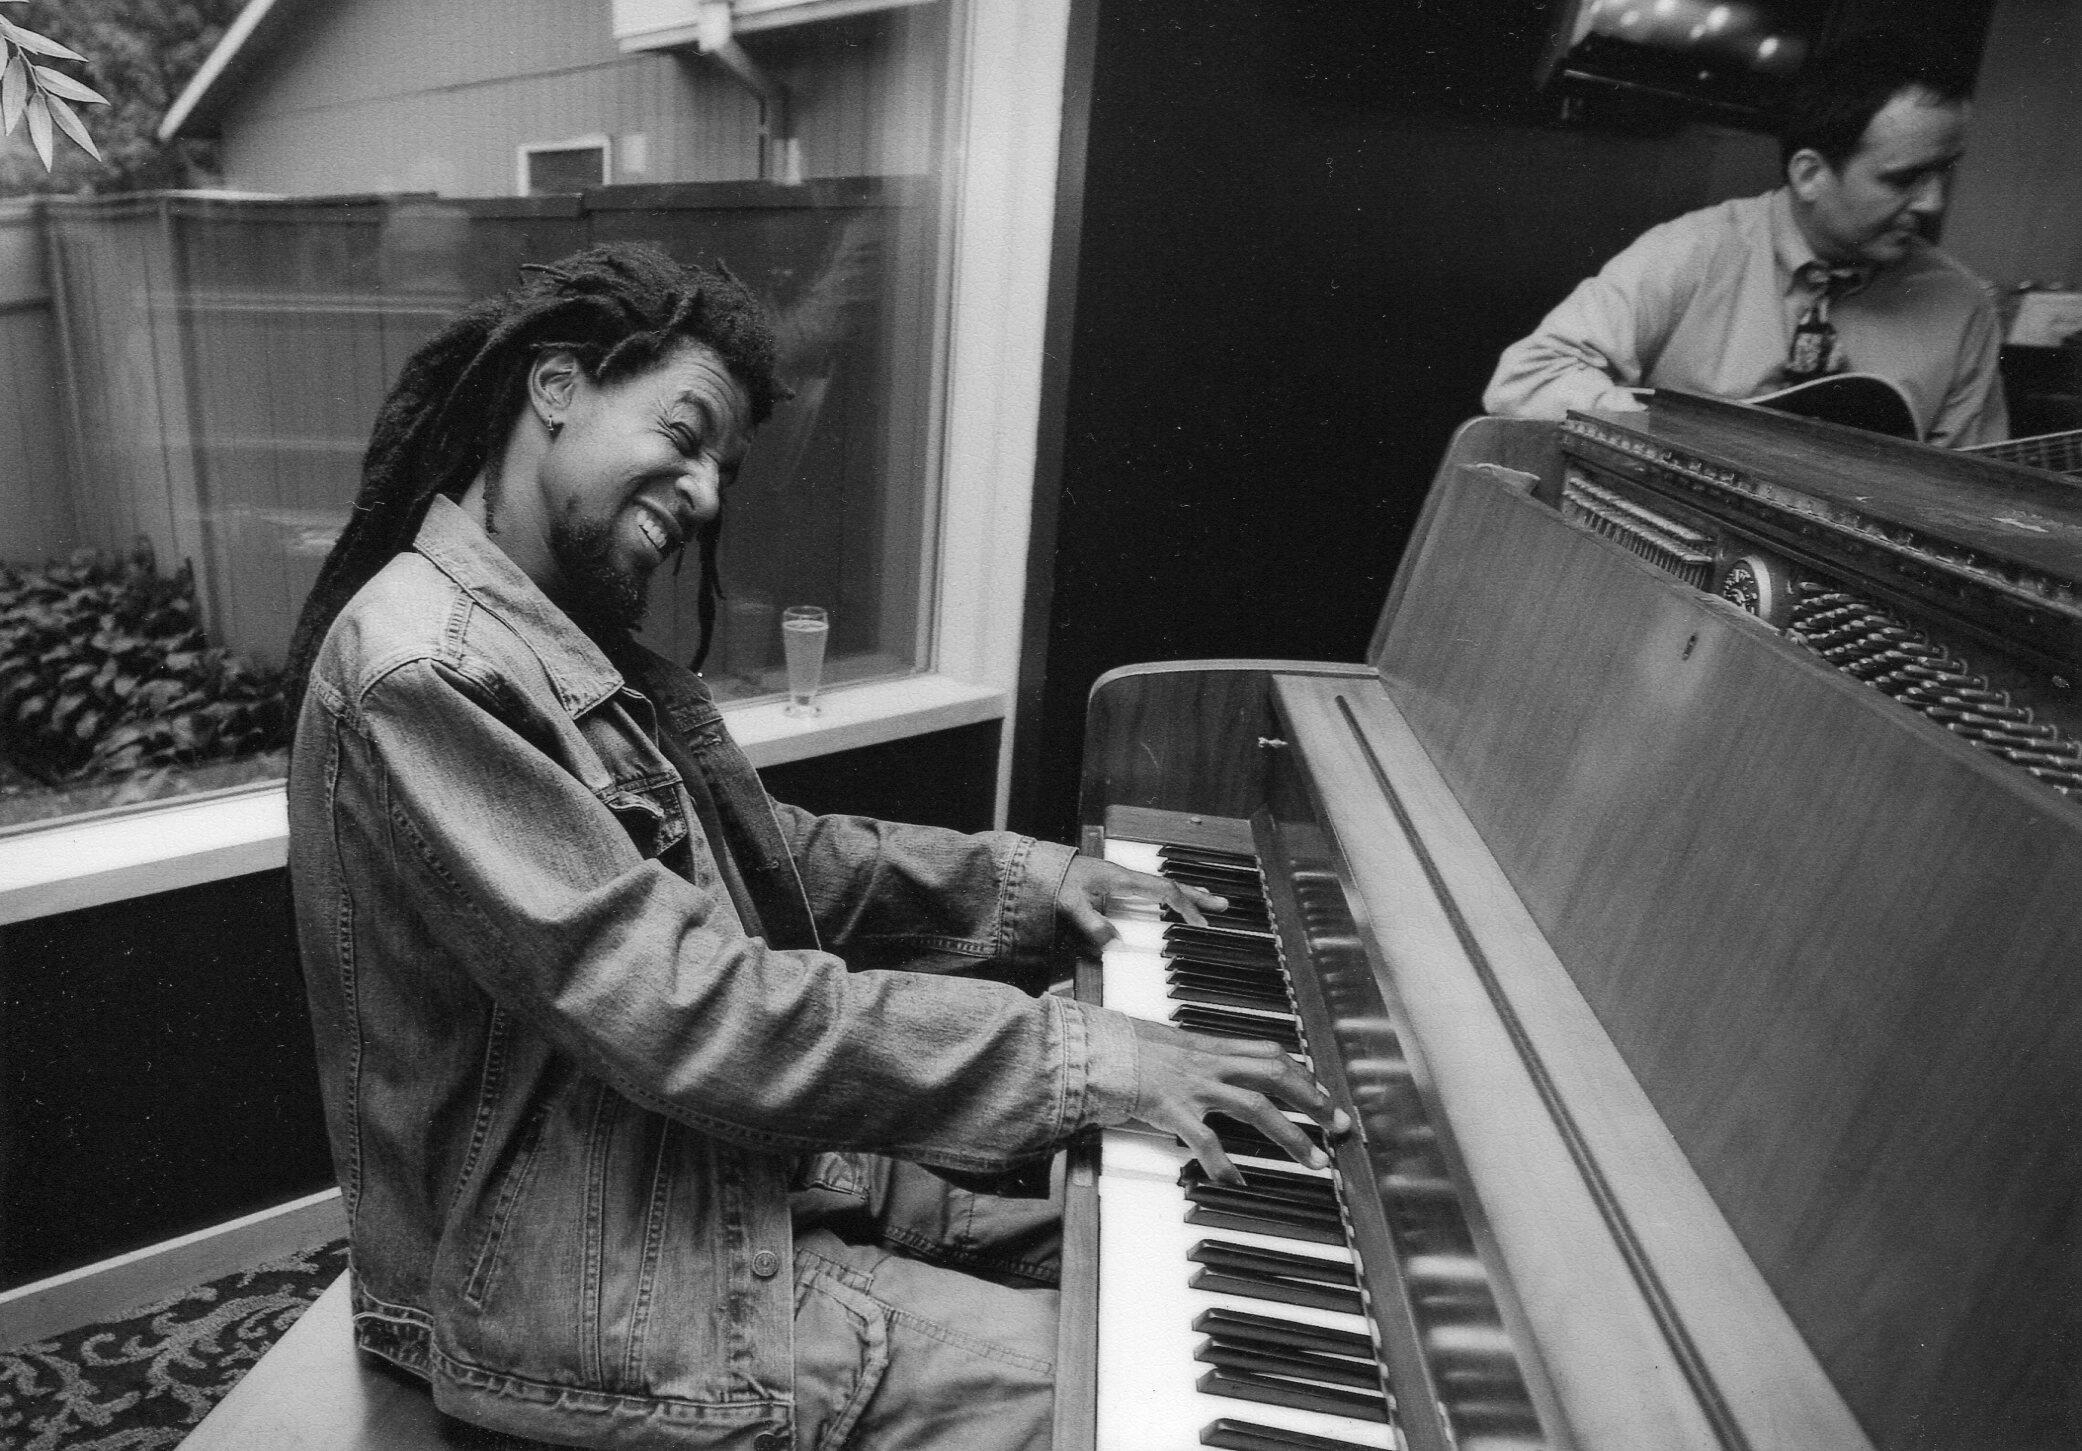 Douglas-Felipe-Diante-da-Seca-compositor (1)